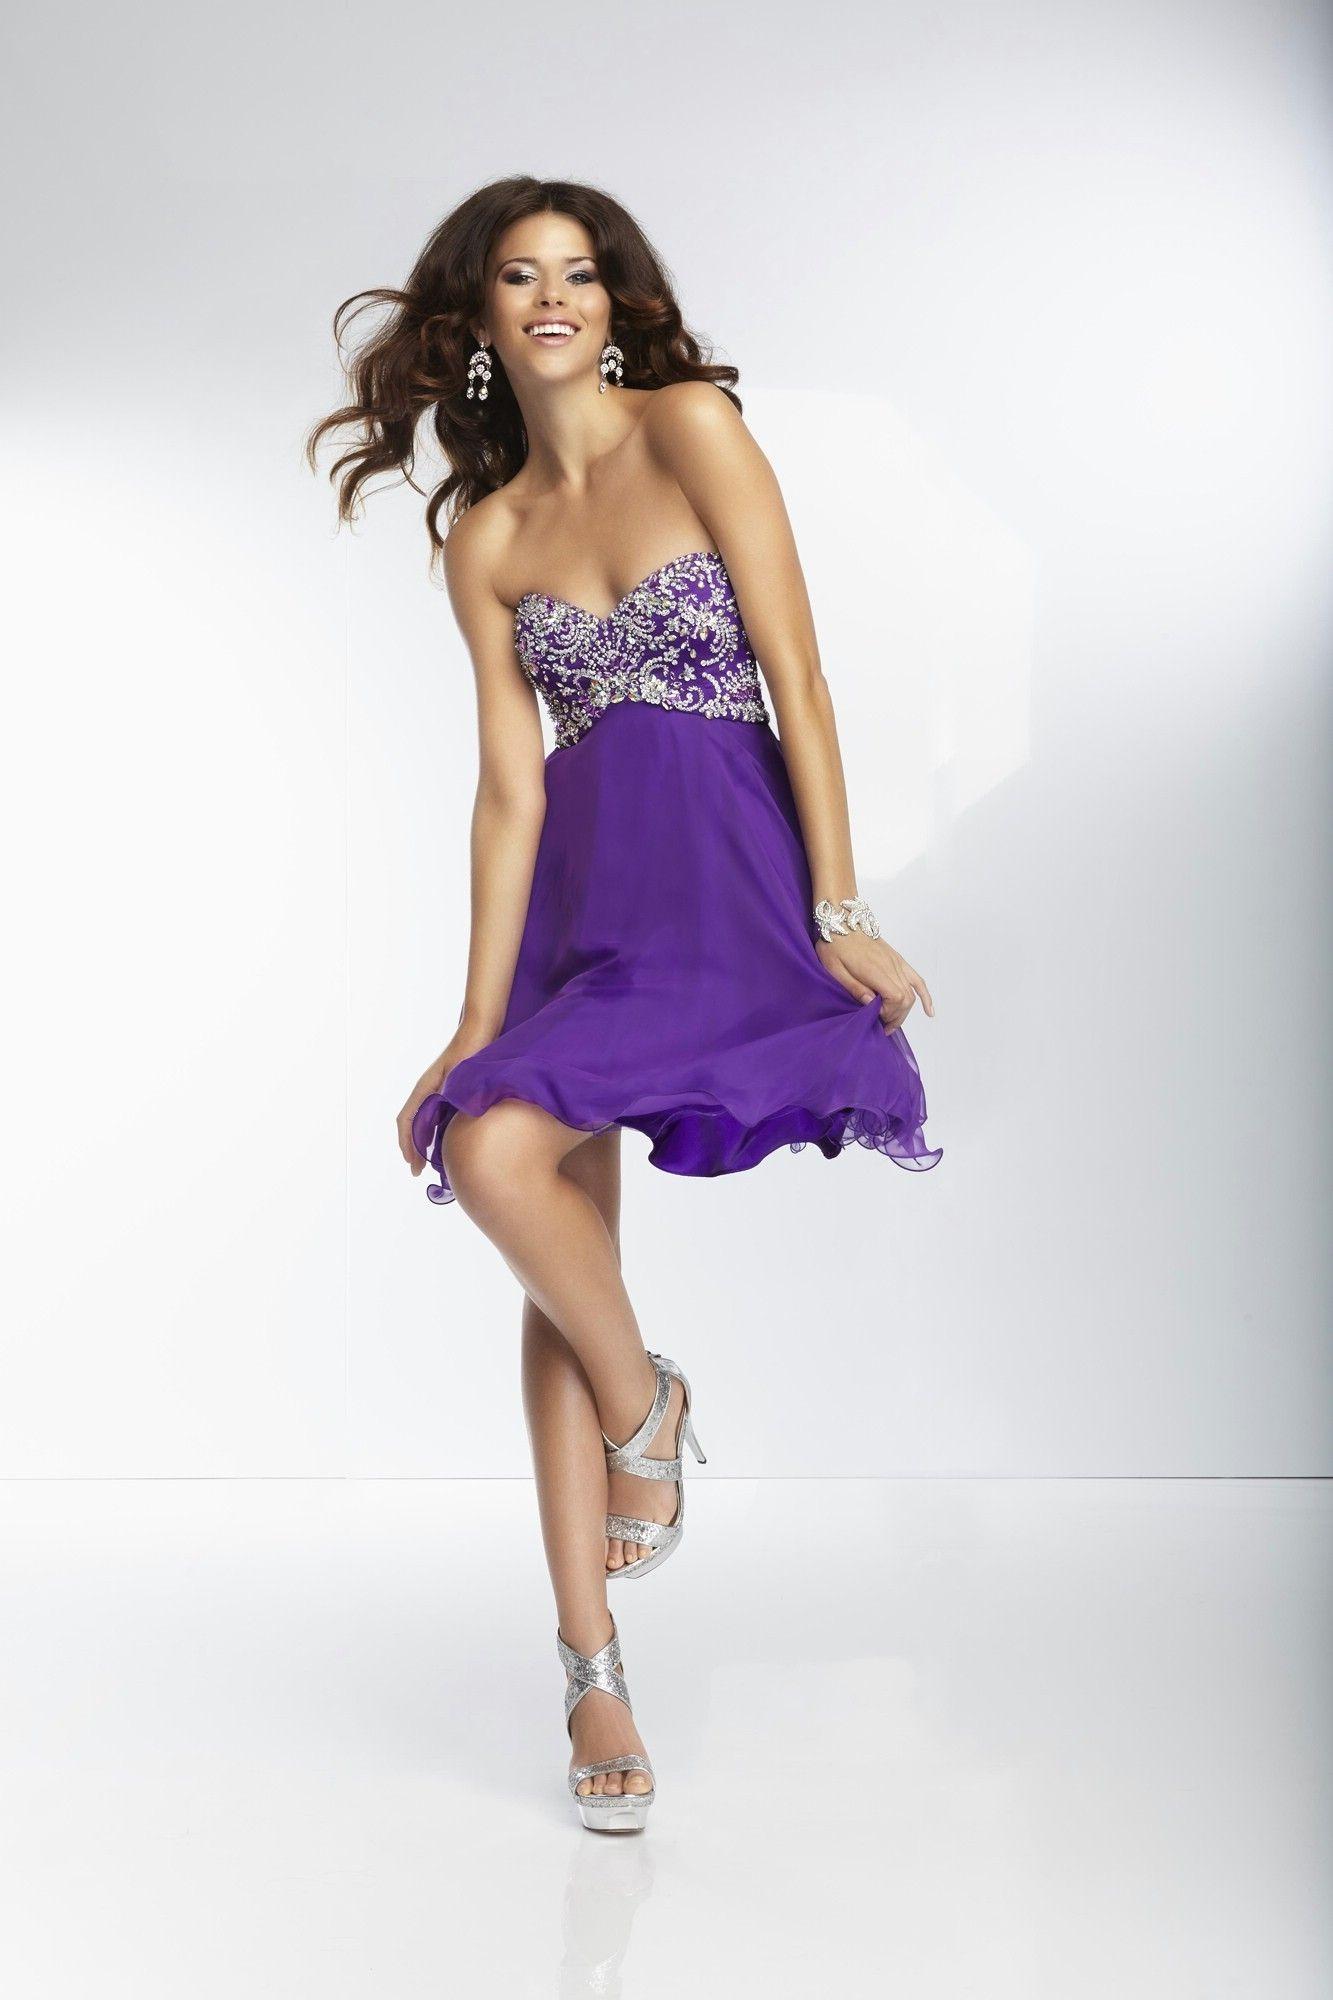 purple-cocktail-dresses-for-weddings- | Cute Cocktail Dresses Ideas ...